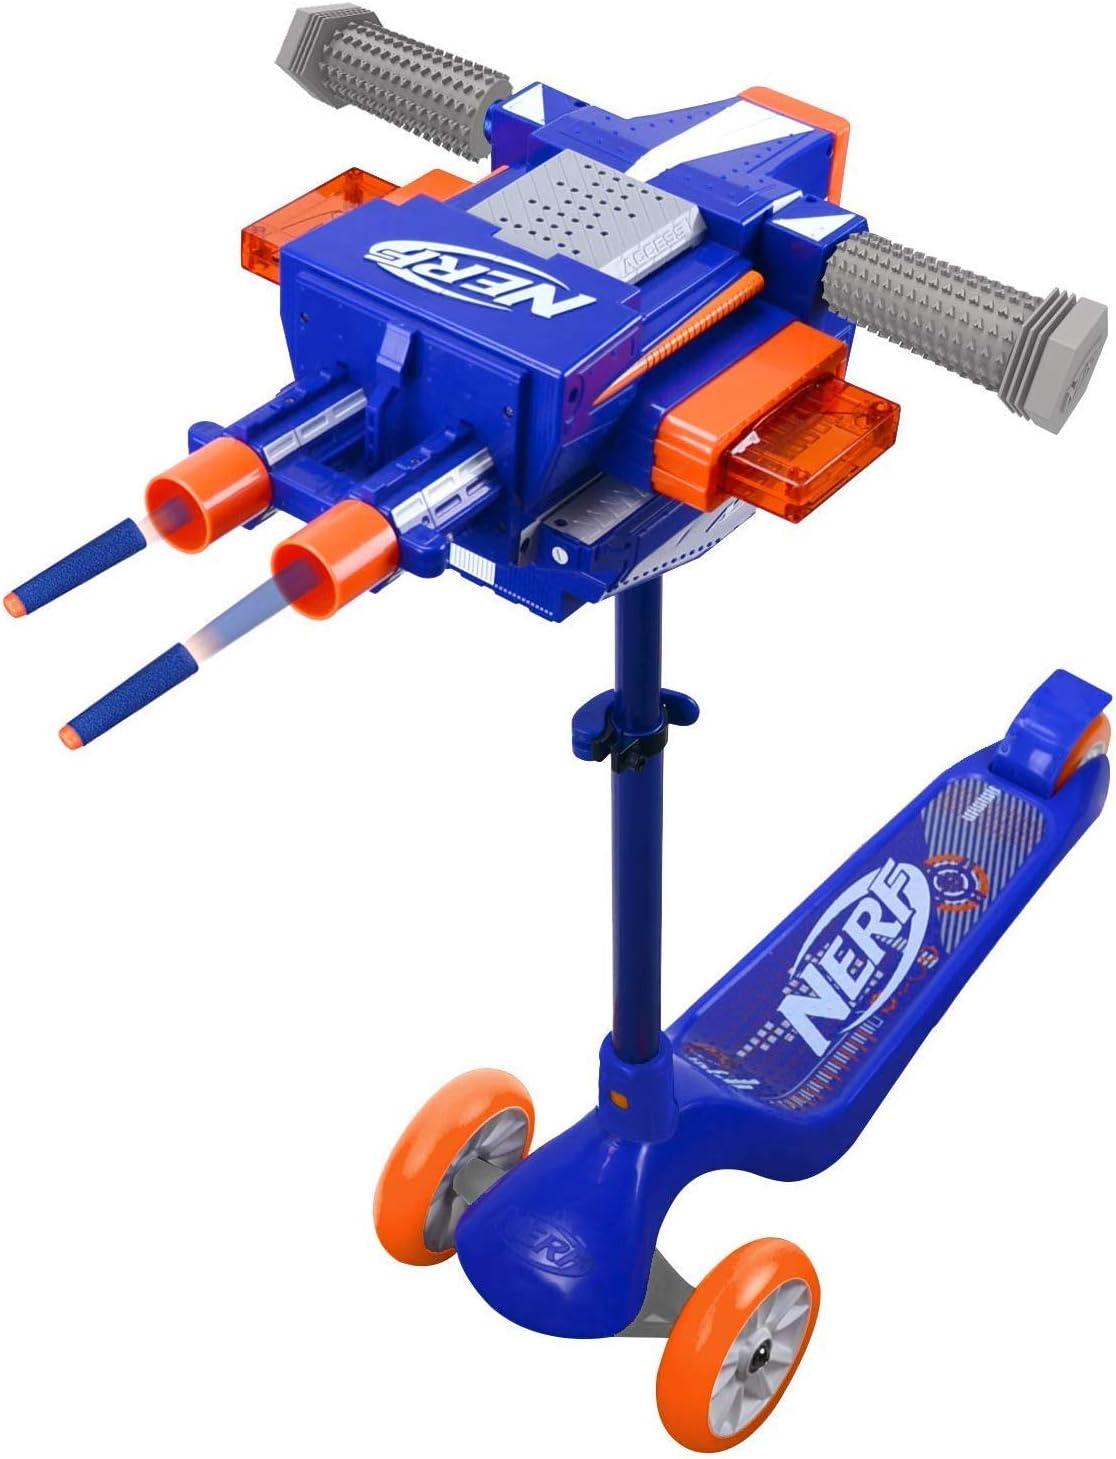 NERF Blaster Scooter Dual Trigger, קורקינט 3 גלגלים